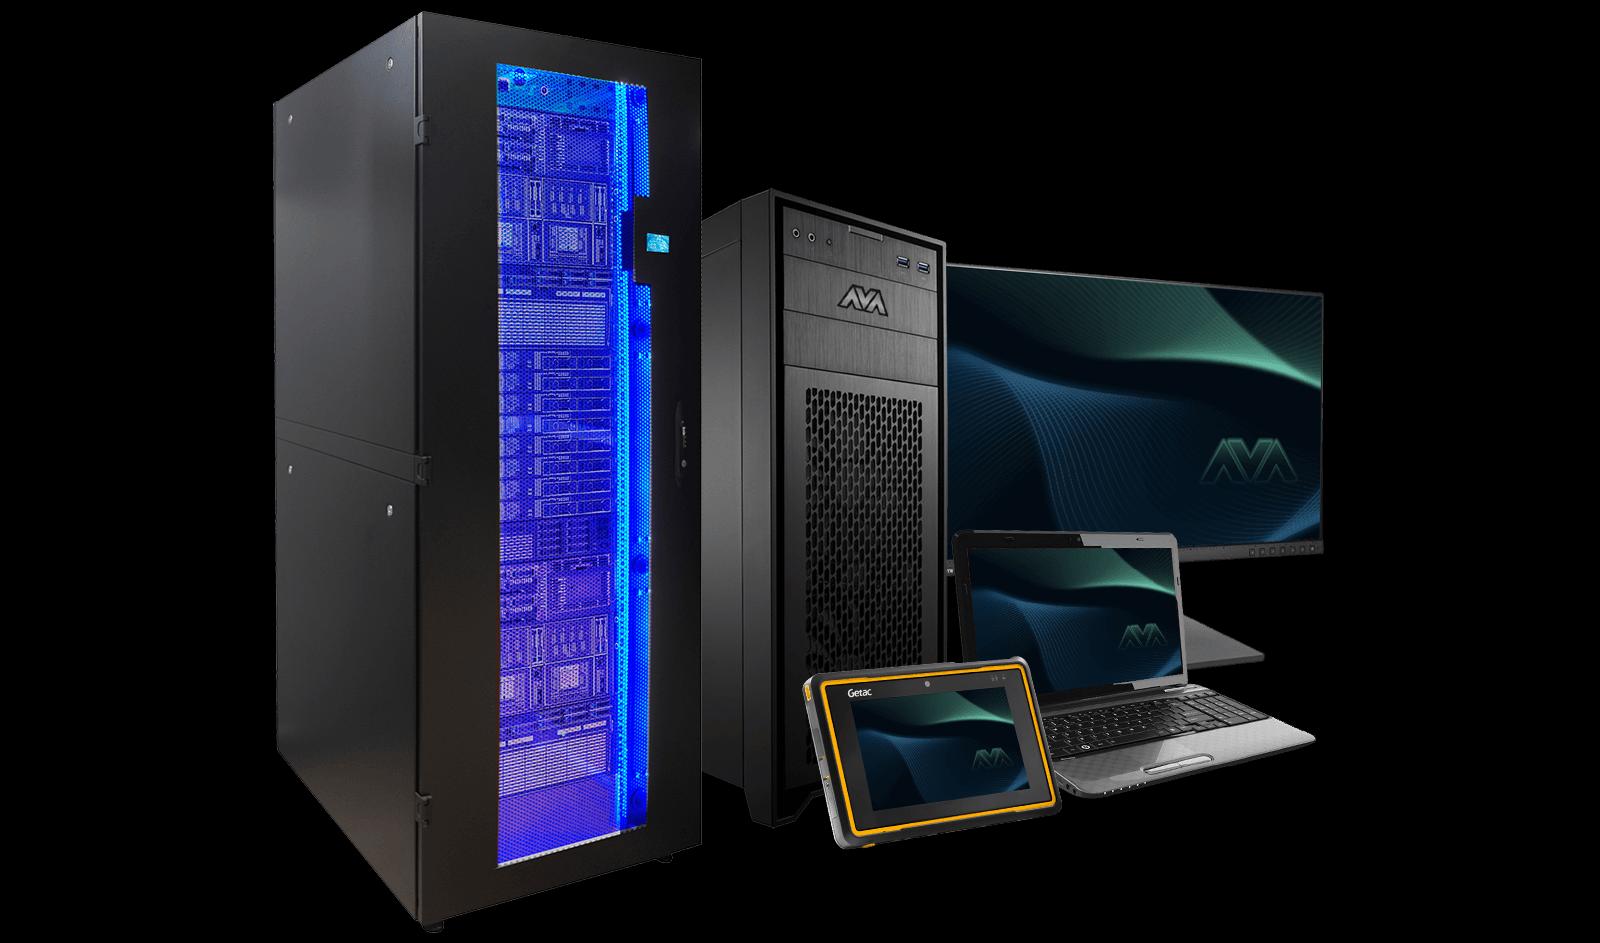 AVA computer tower